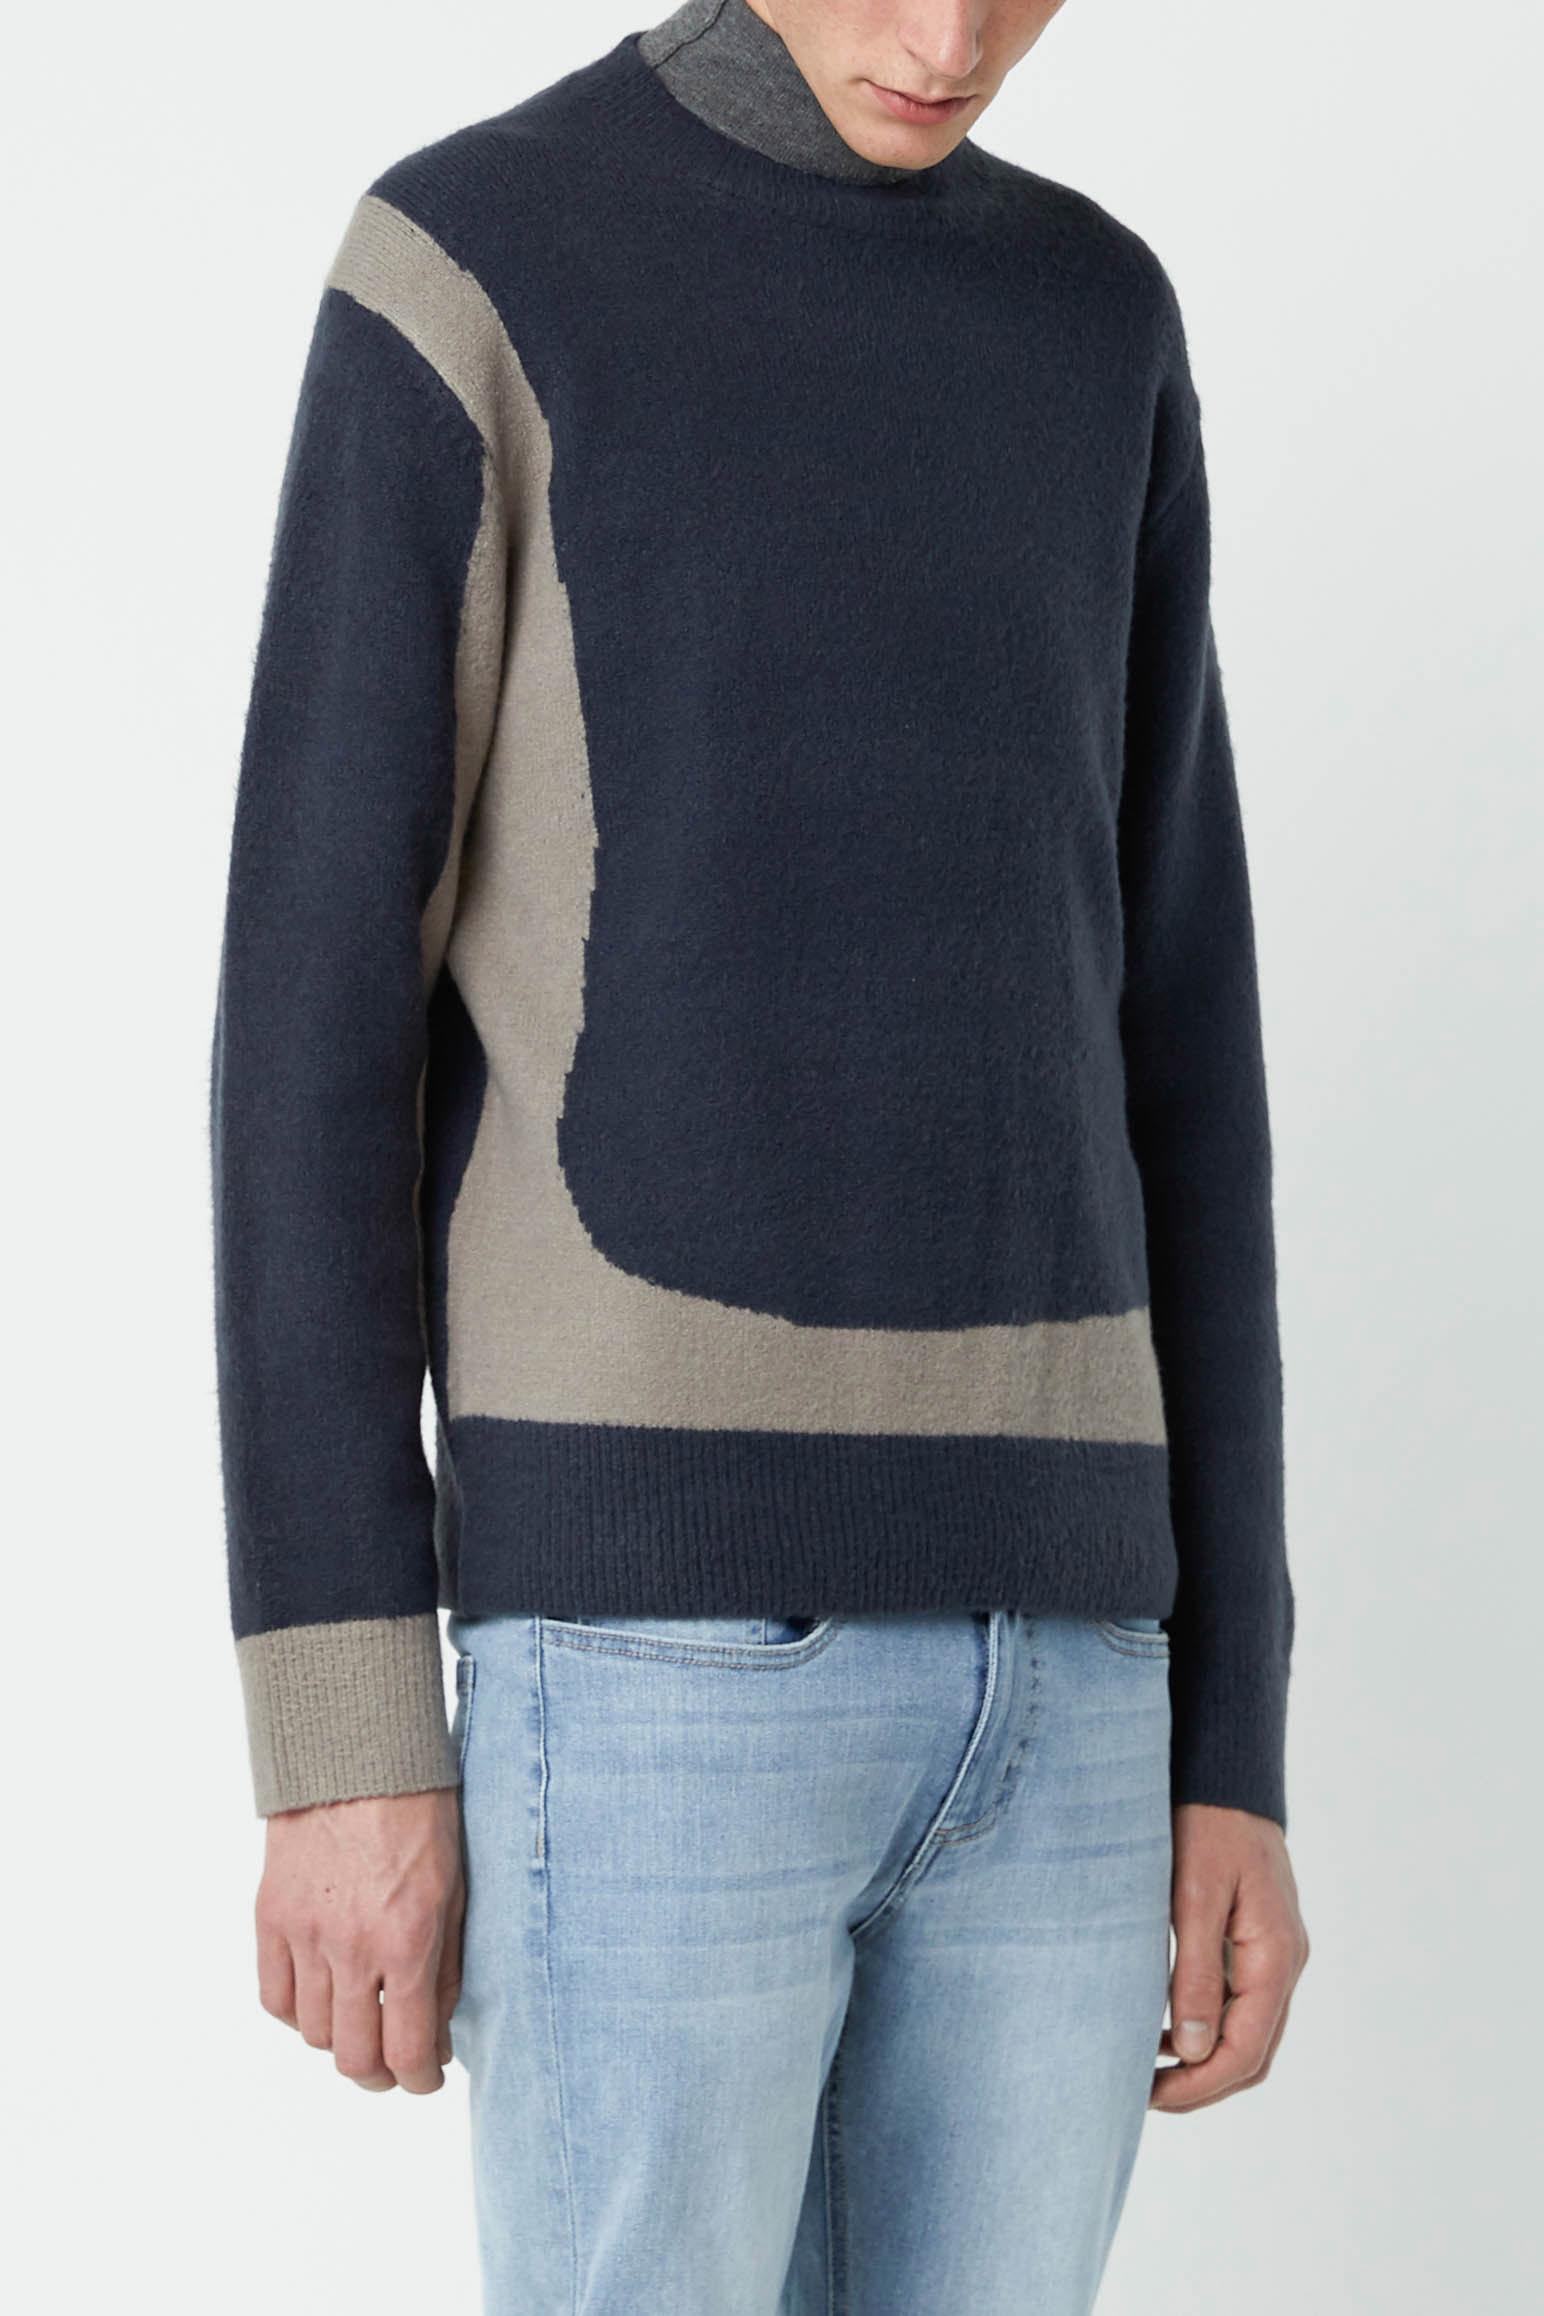 Sweater 2675 Navy 1